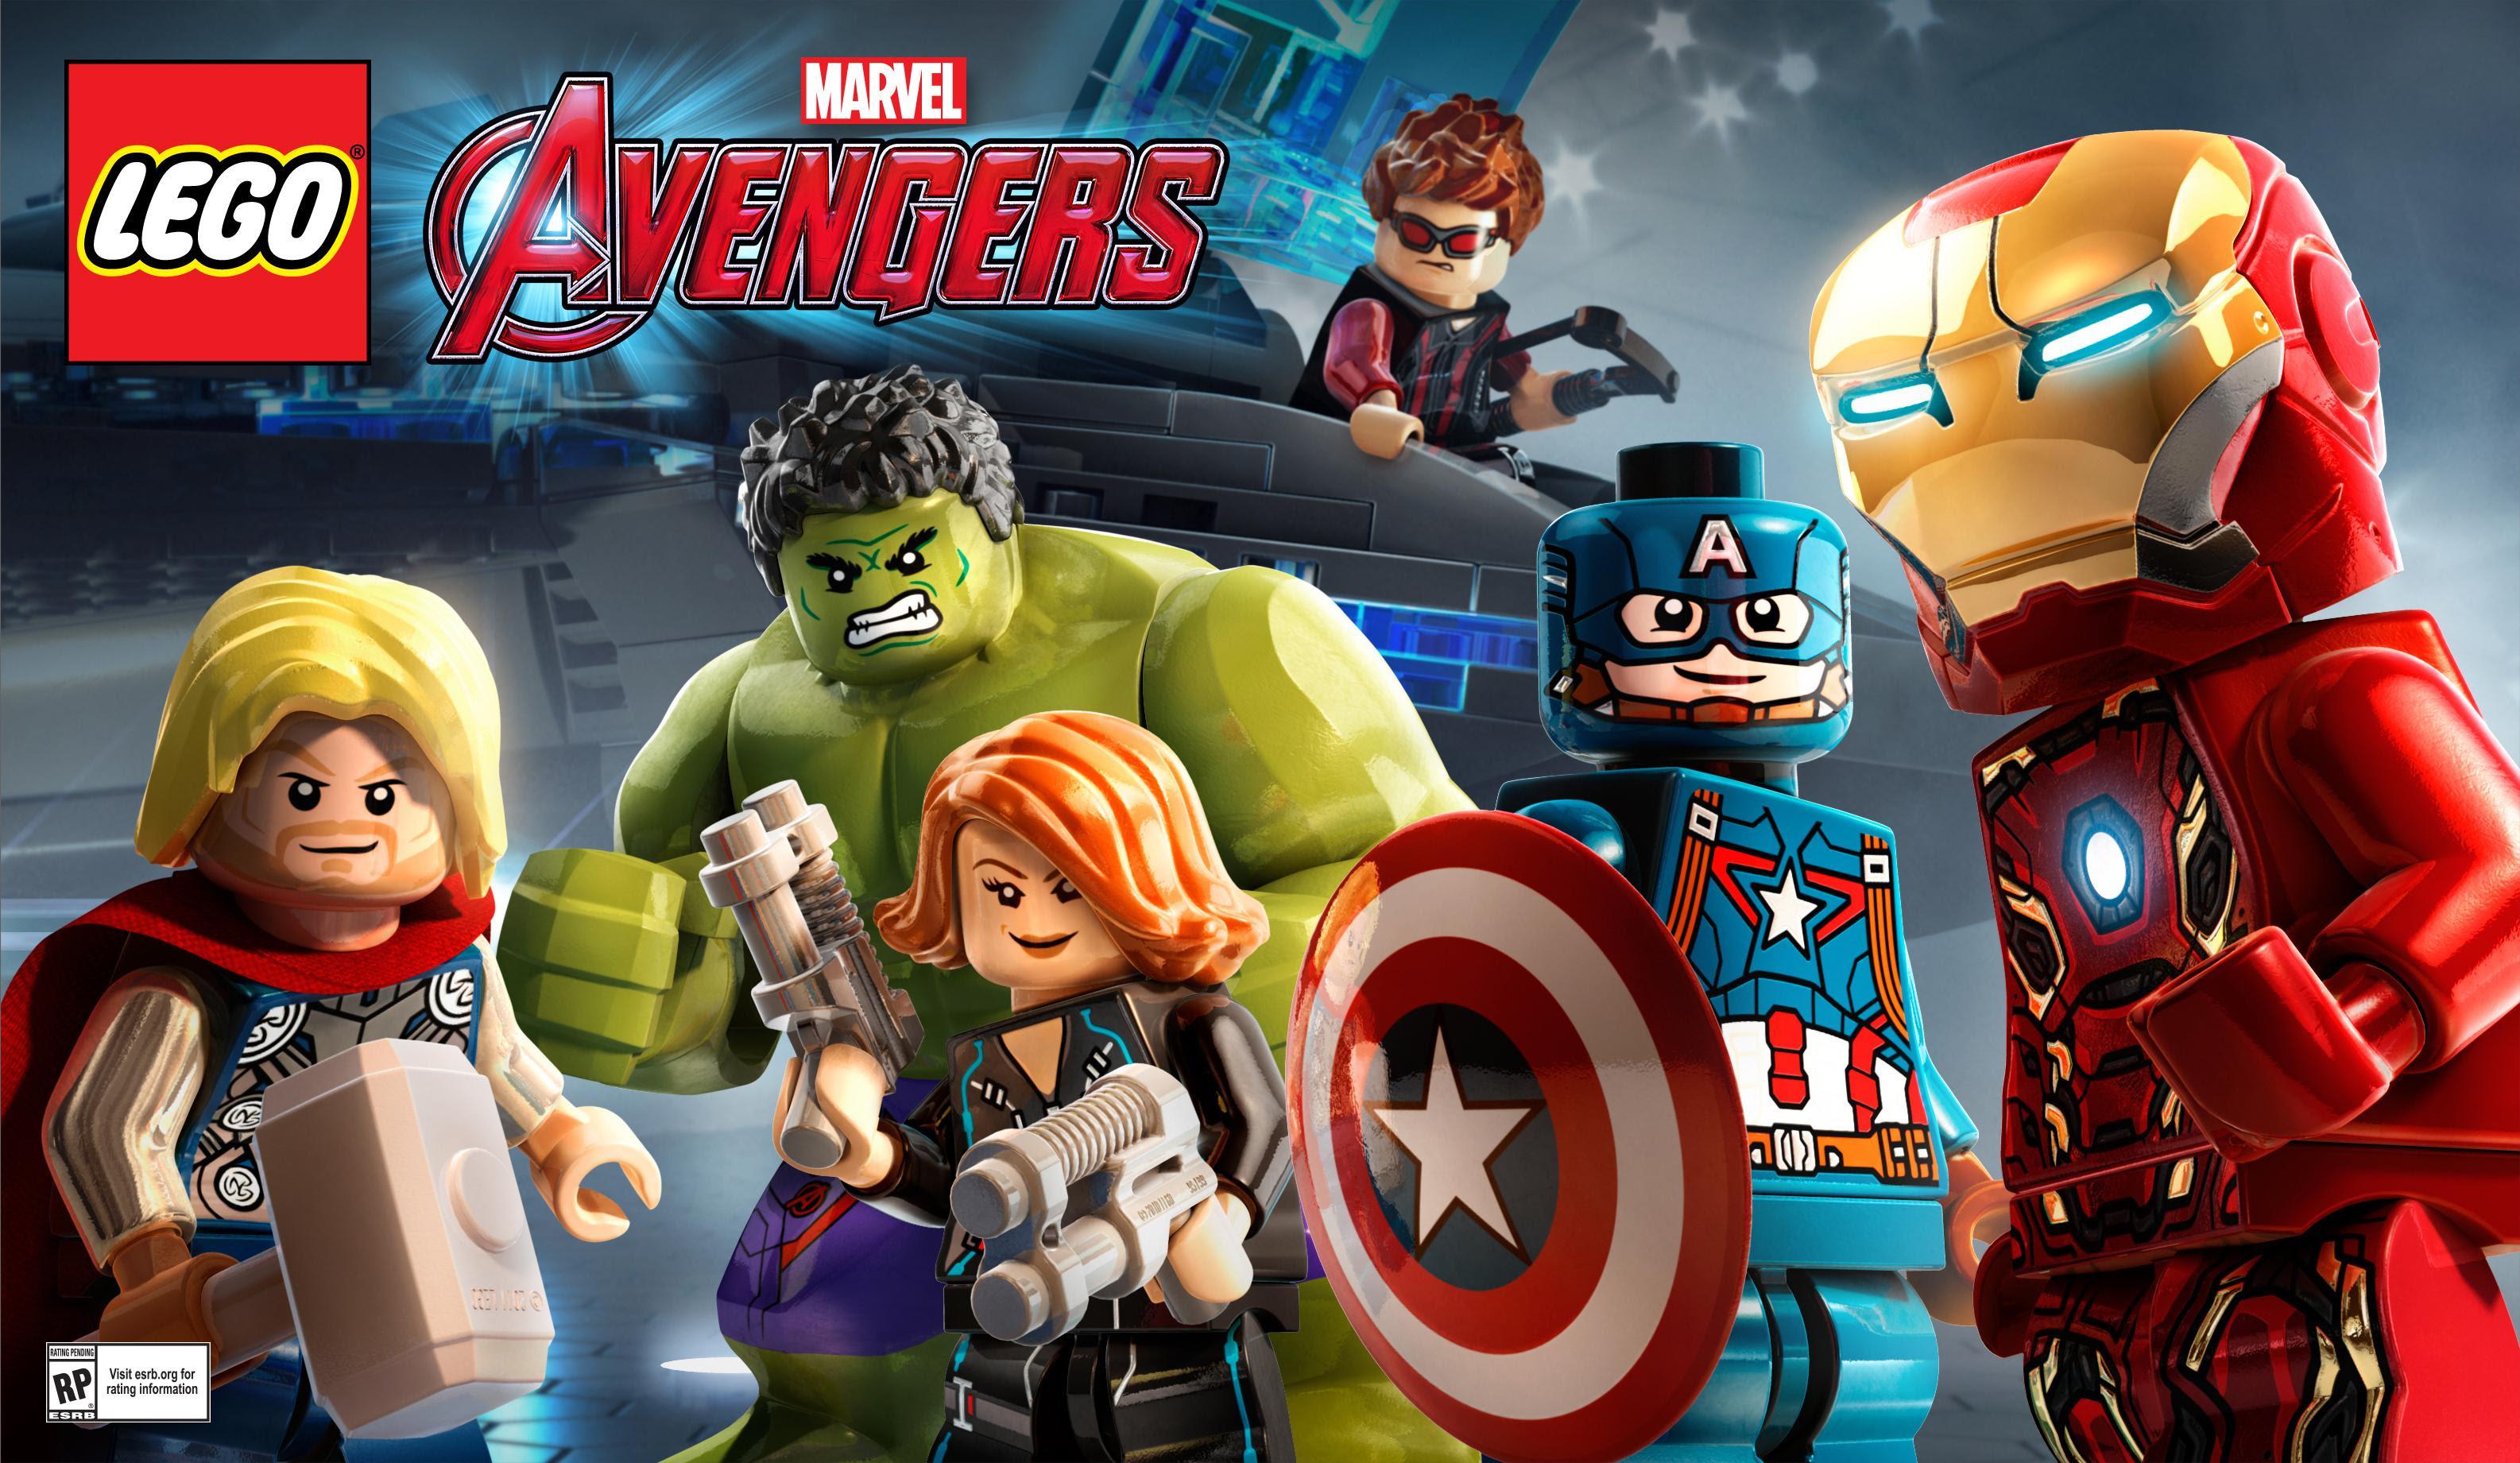 LEGO Marvel Avengers - סיקור משחק הלגו החדש בחבורה